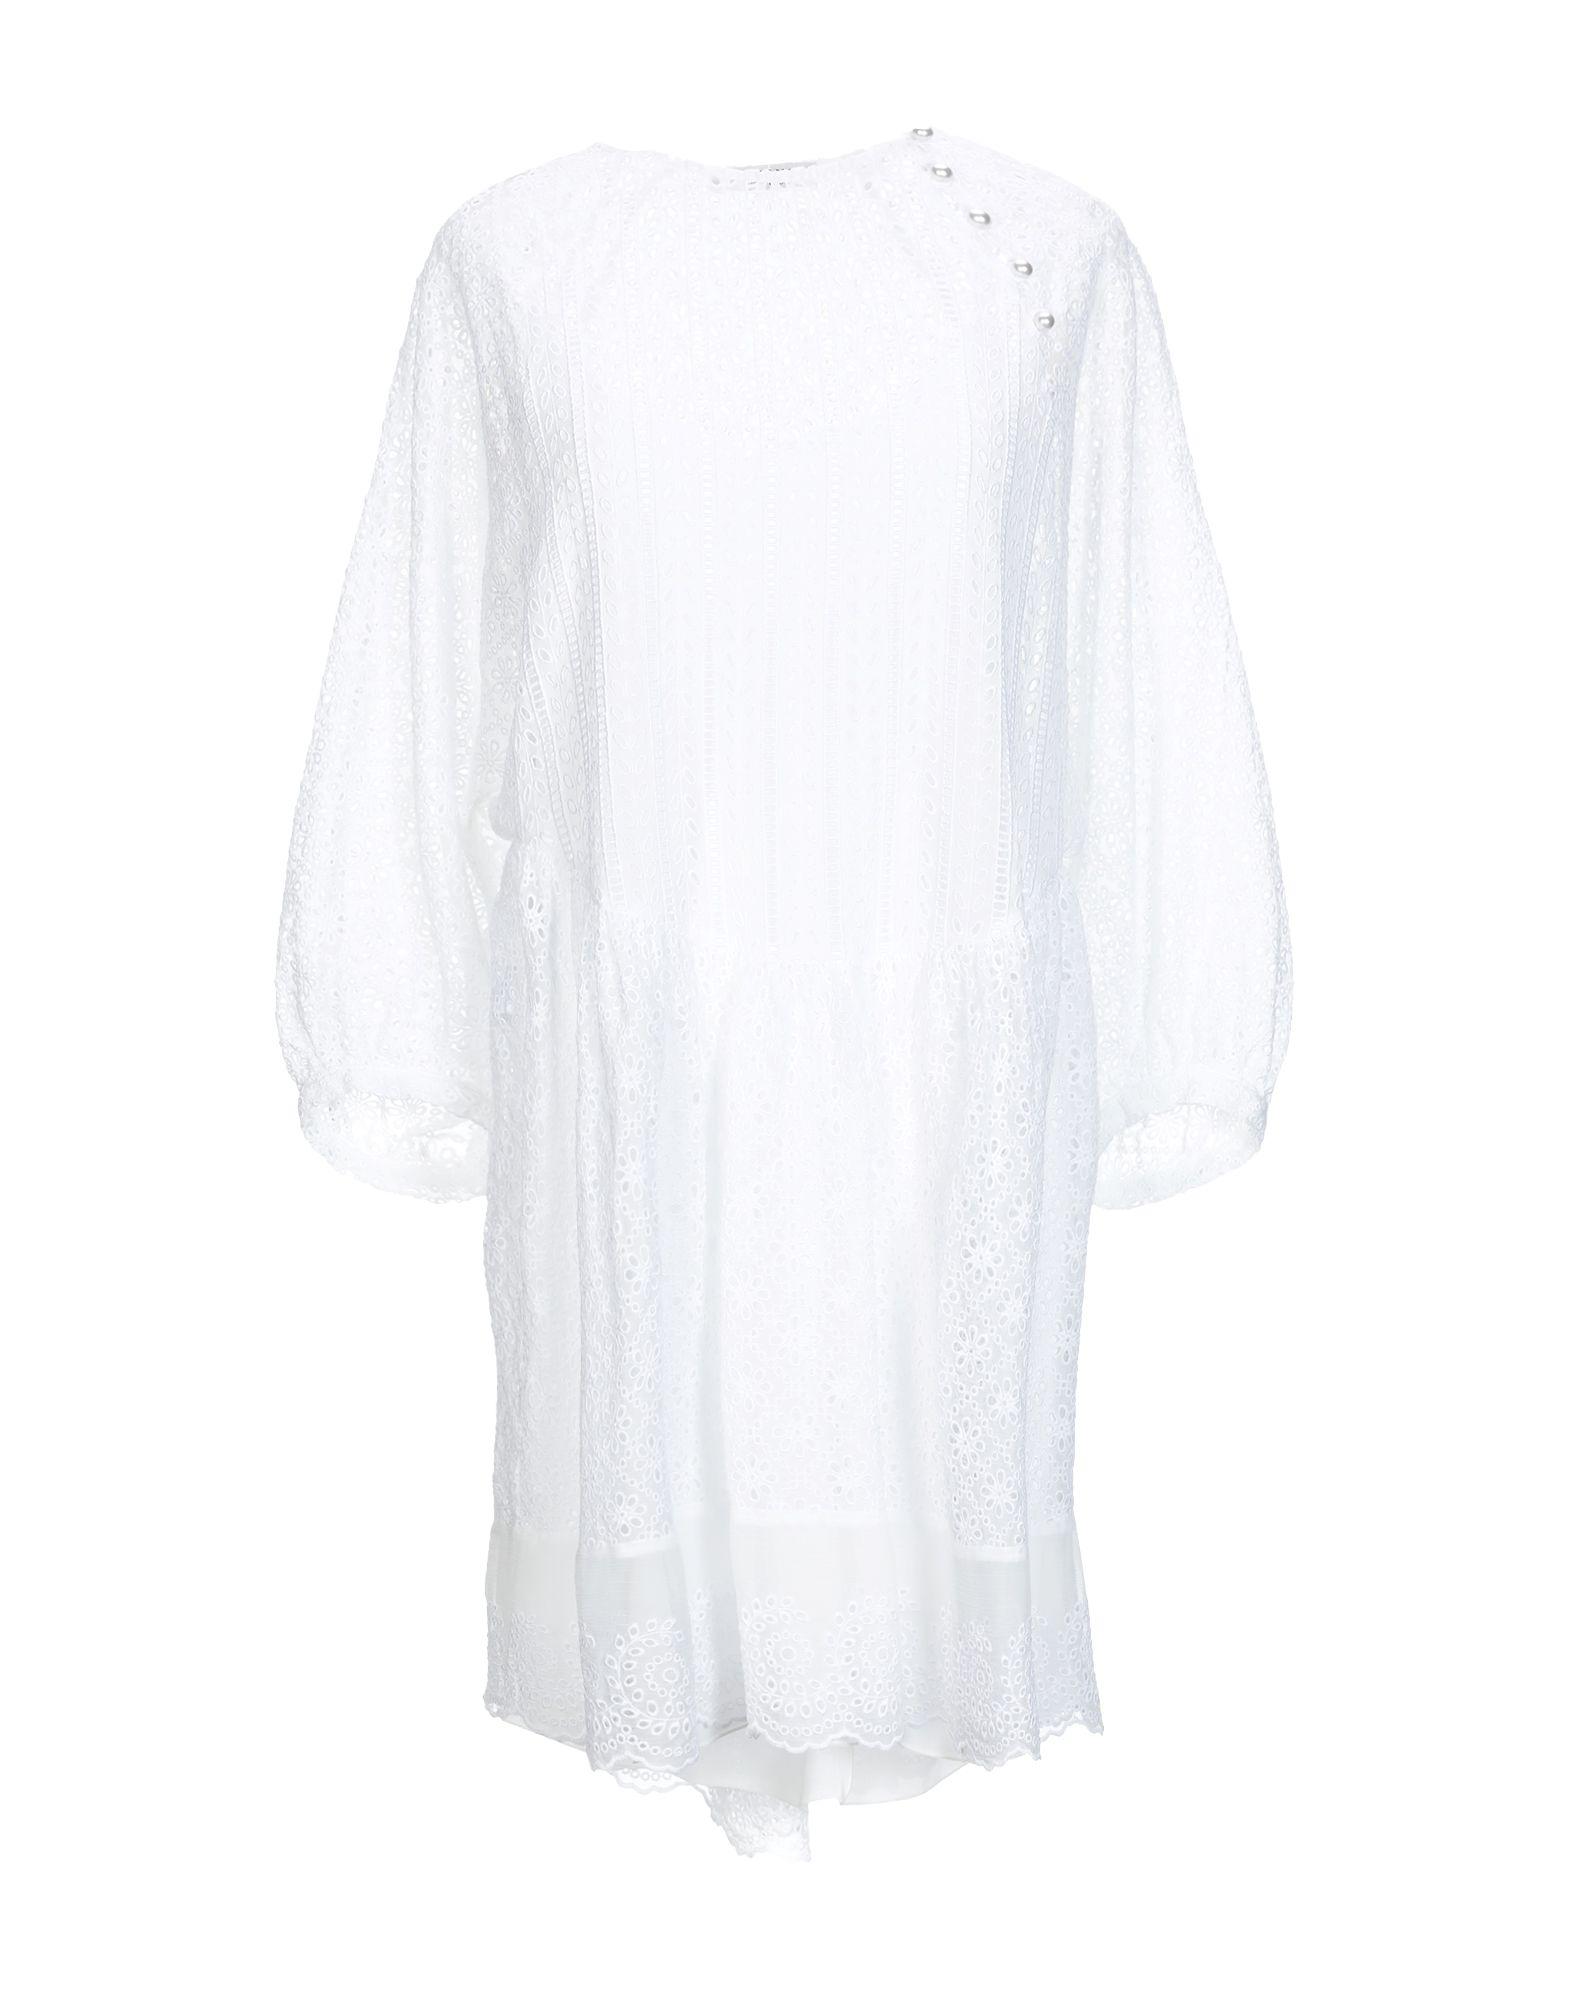 PHILOSOPHY di LORENZO SERAFINI Короткое платье платье di tashe di tashe mp002xw0djpy